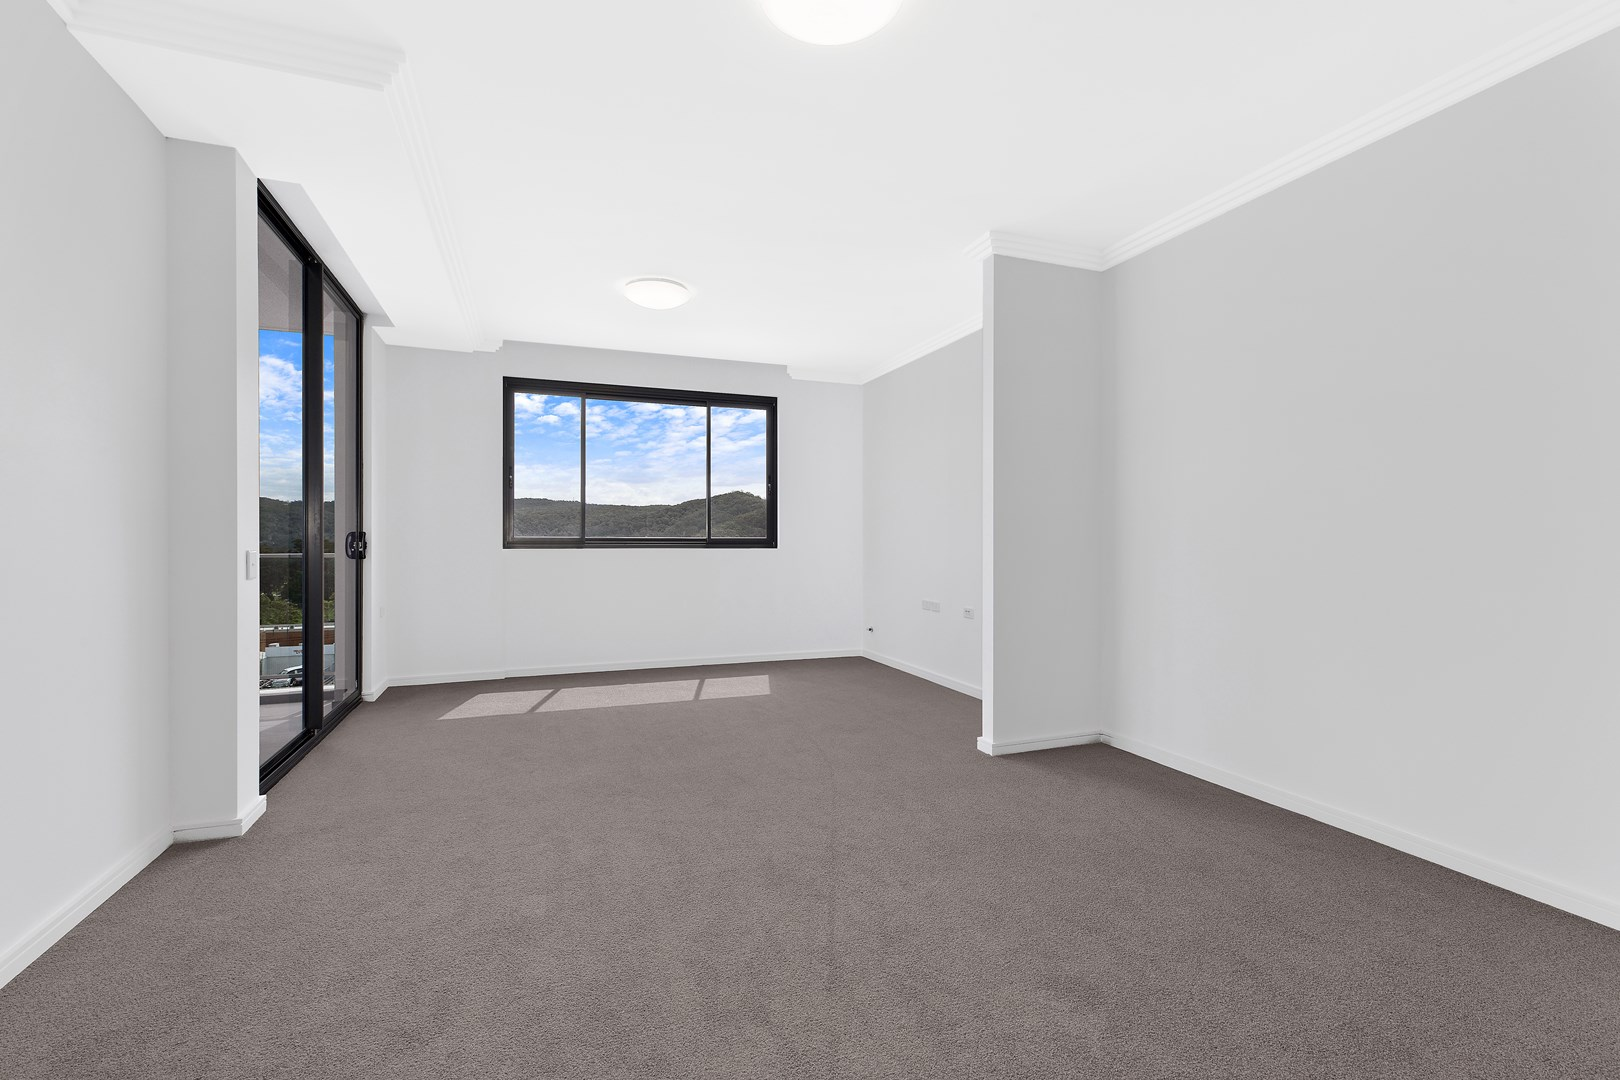 23/66-70 Hills Street, North Gosford NSW 2250, Image 0